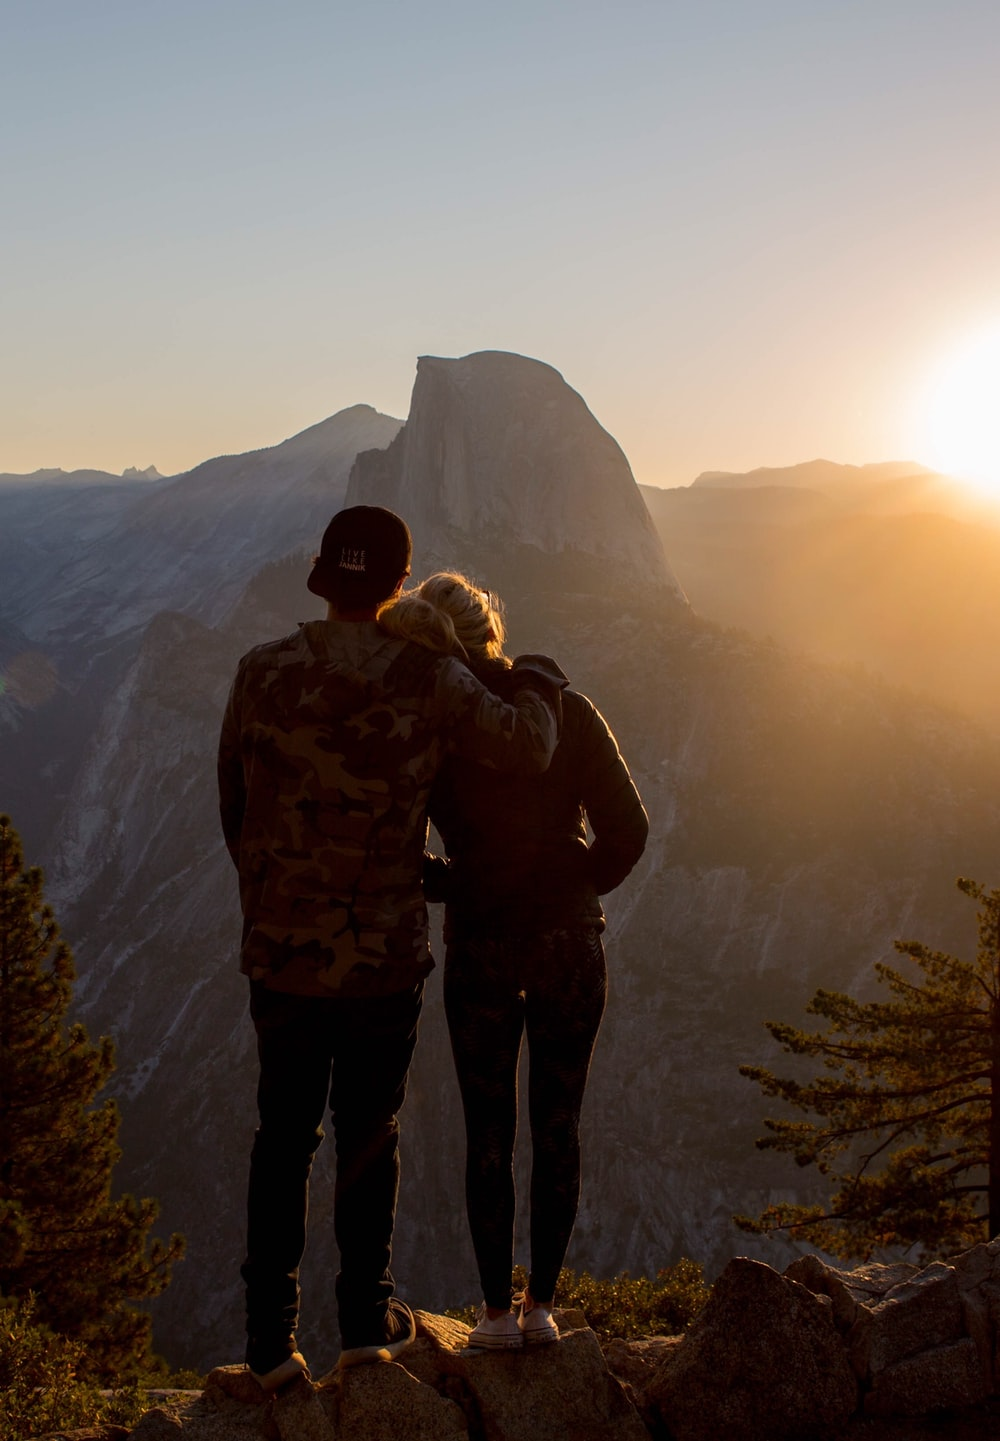 man and woman standing on ridge of hill watching setting sun